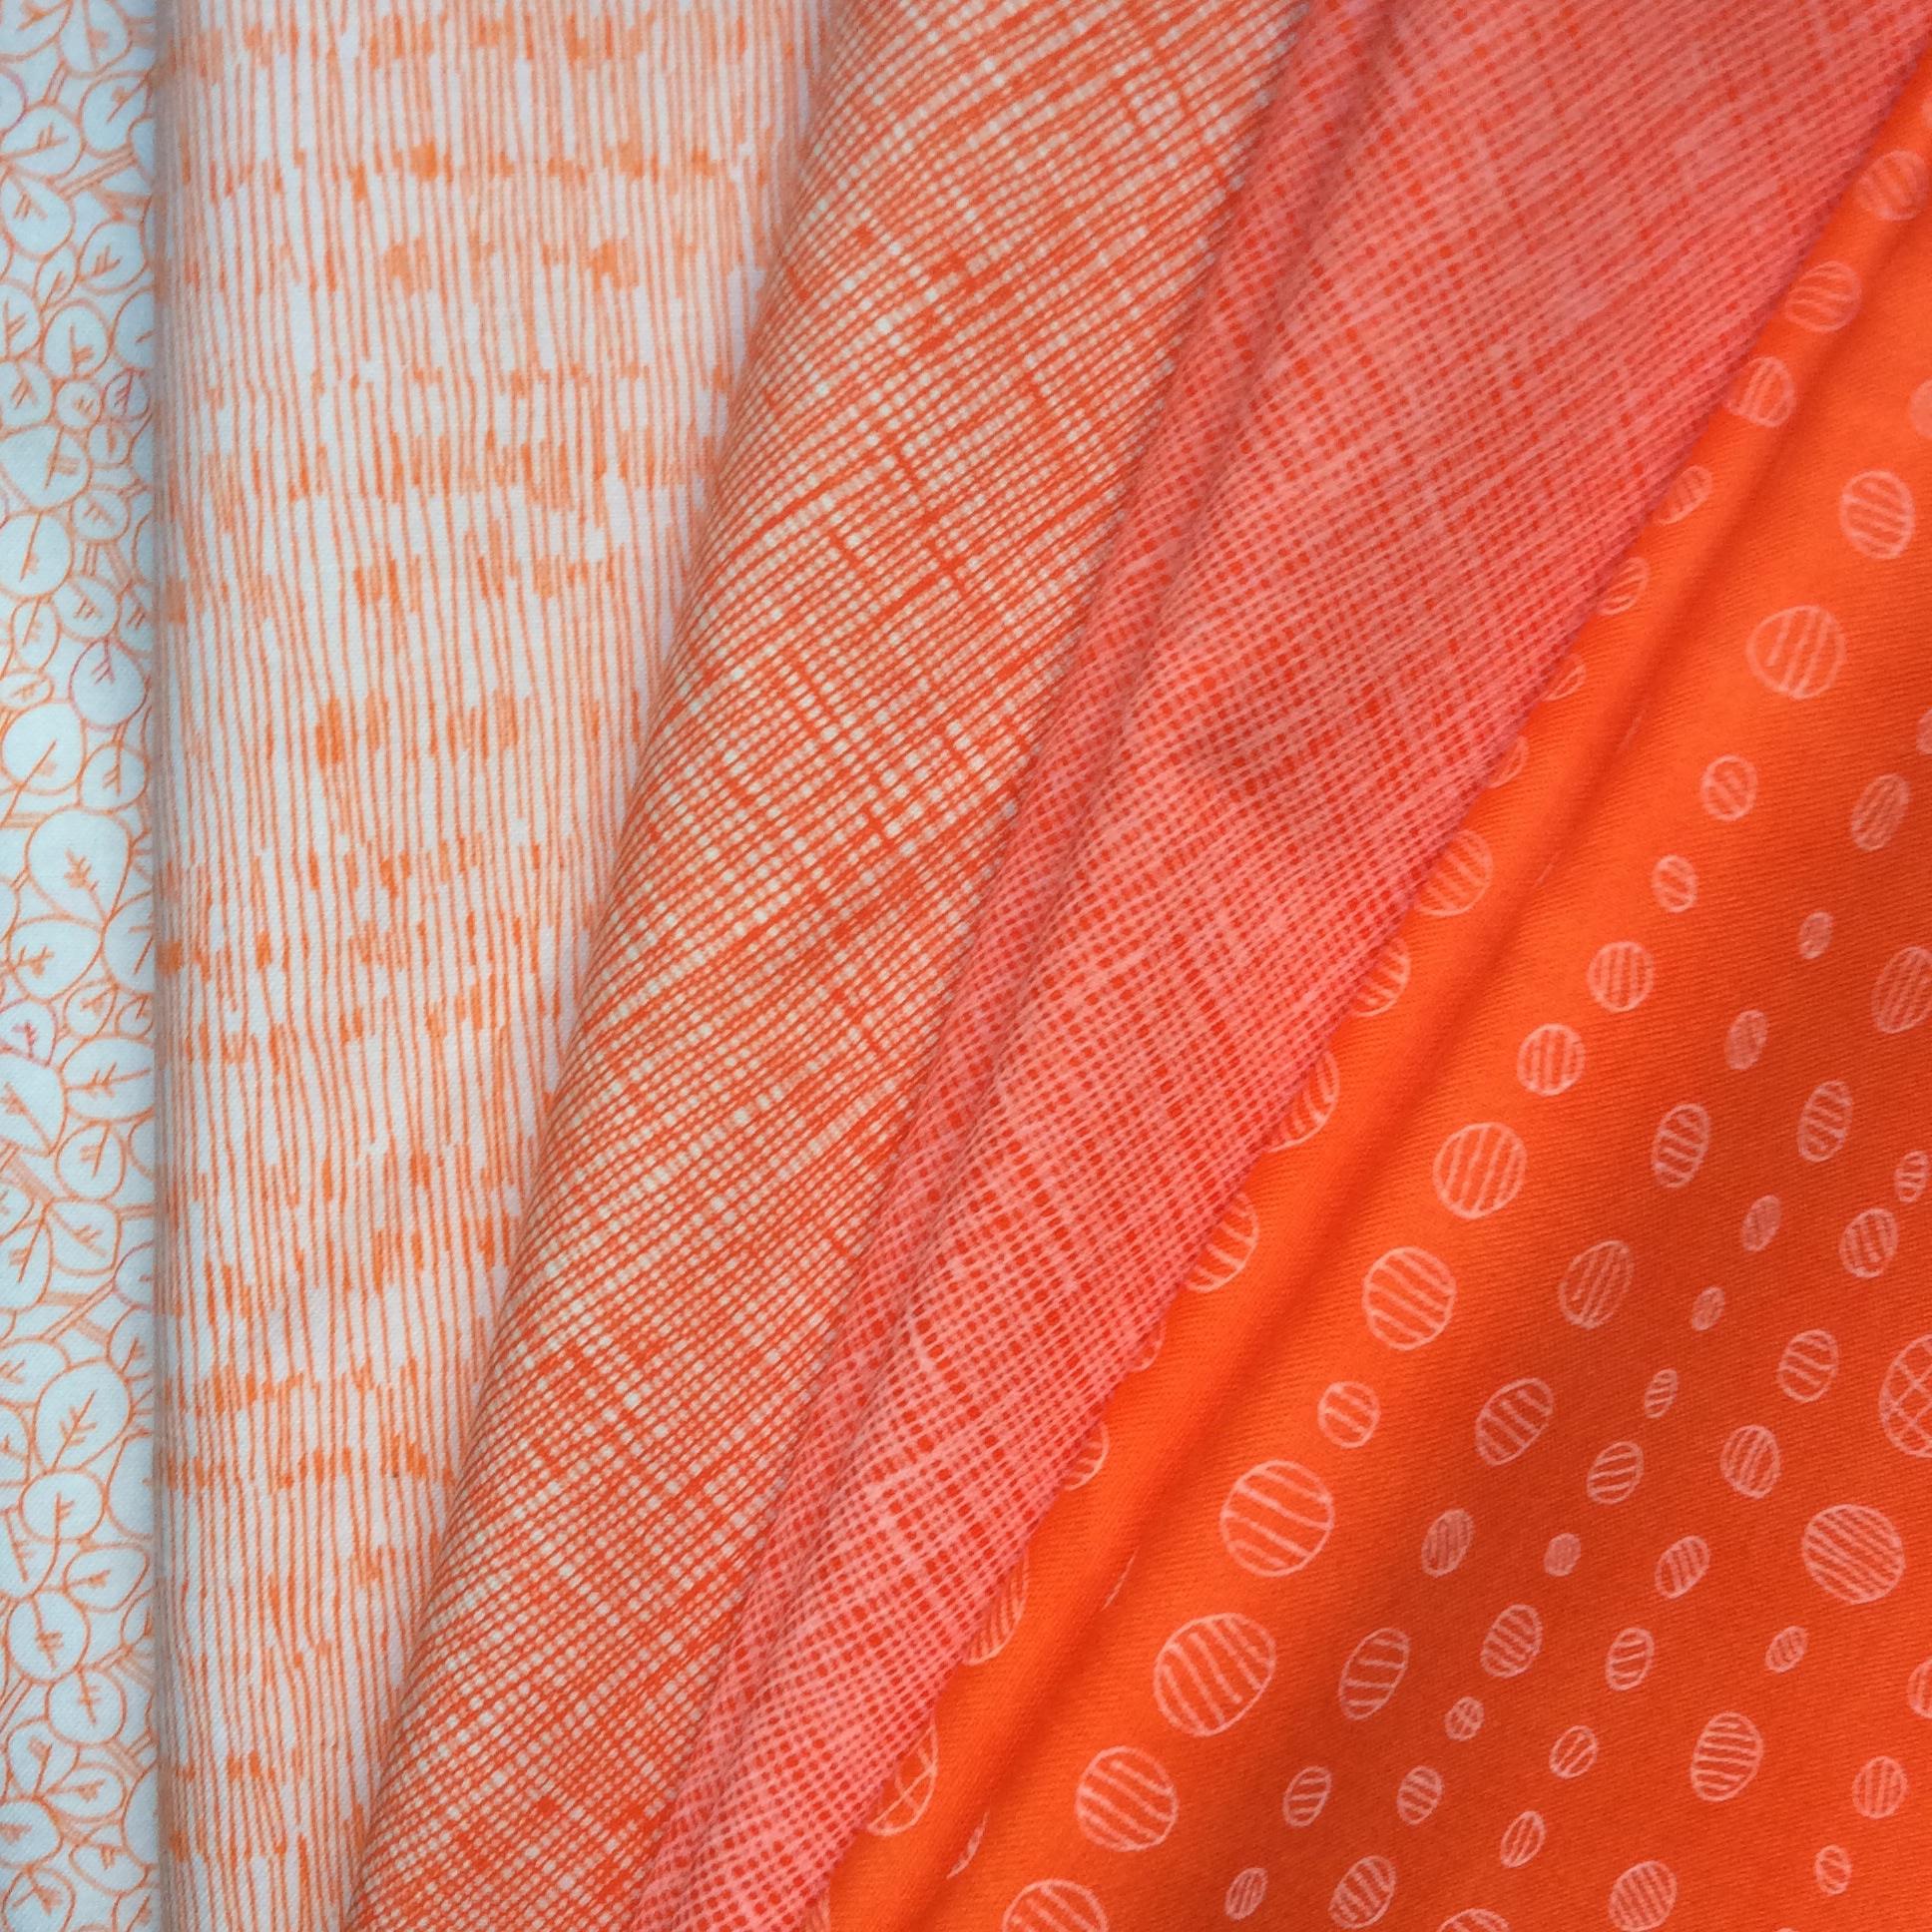 Orange Carolyn Friedlander Amazingness